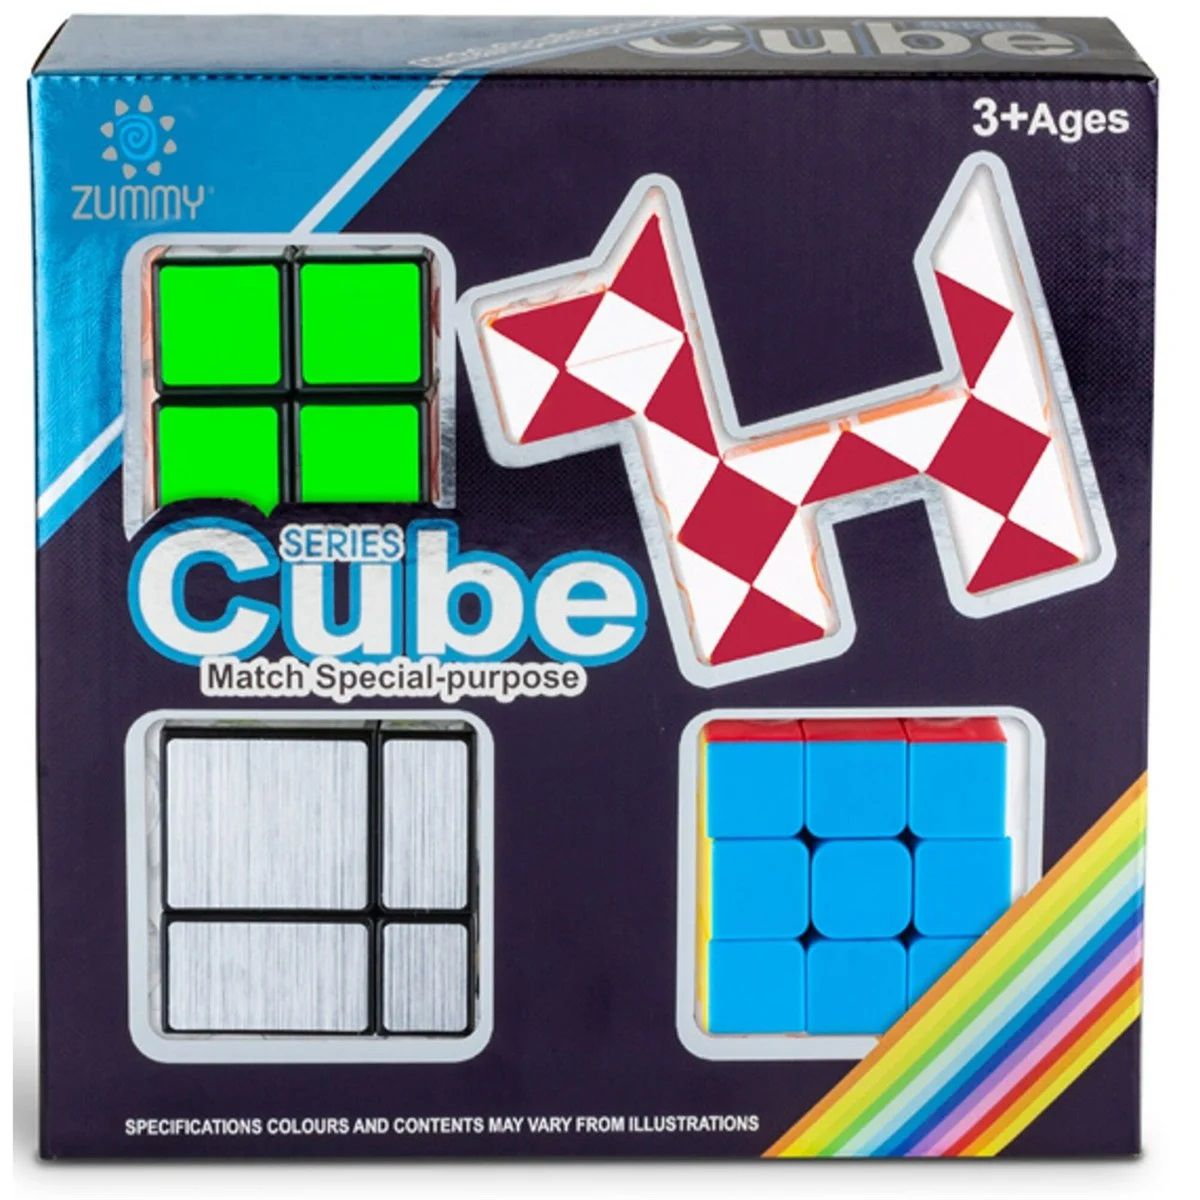 Kit Cubo Mágico (4 Modelos) - Series Cube Match Special-Purpose